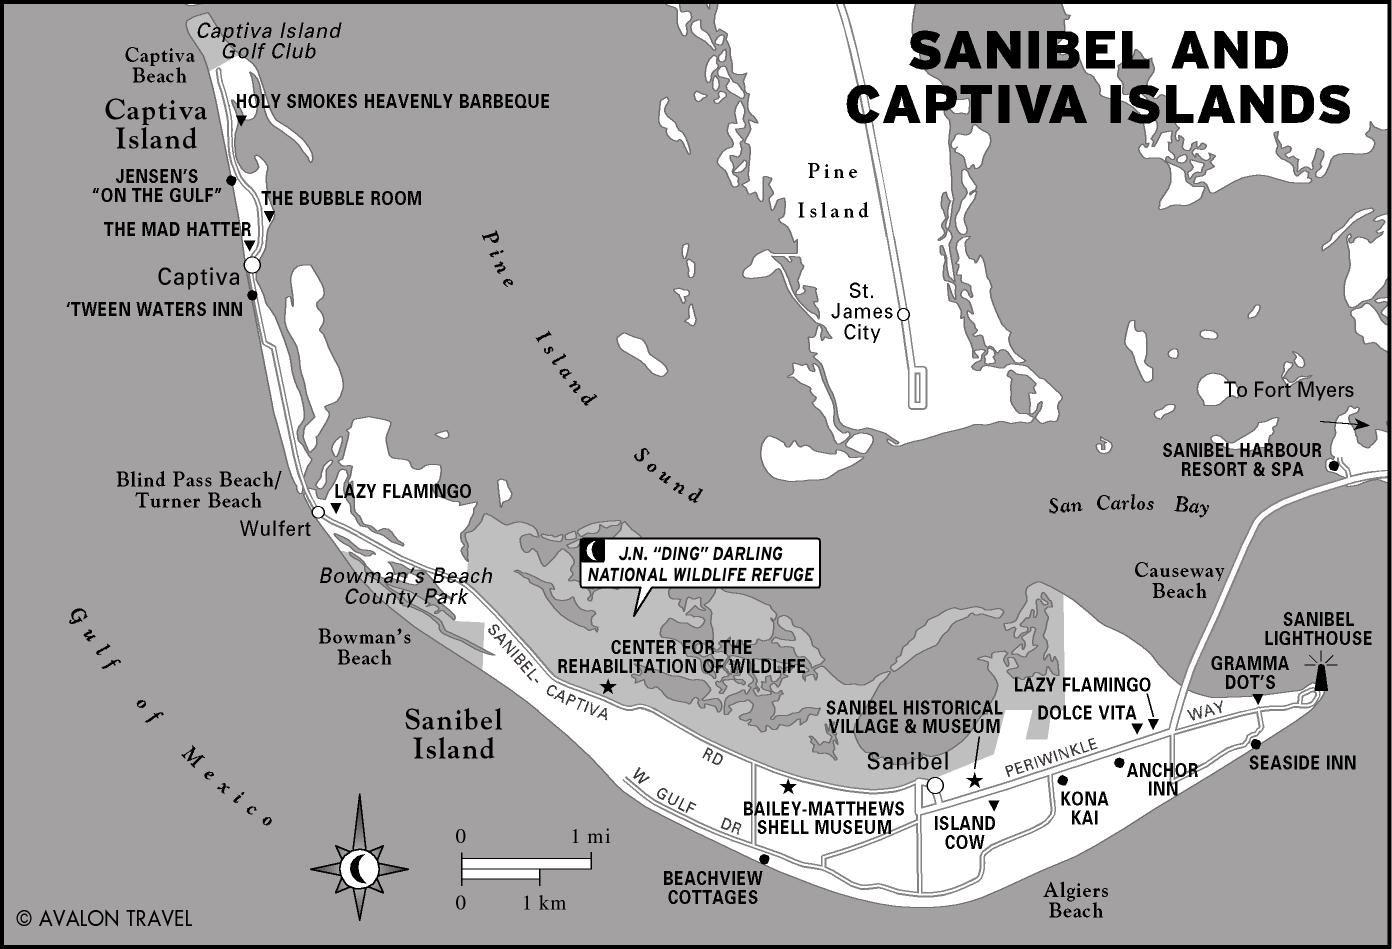 Printable Travel Maps Of Florida And The Gulf Coast   Florida - Florida Gulf Islands Map